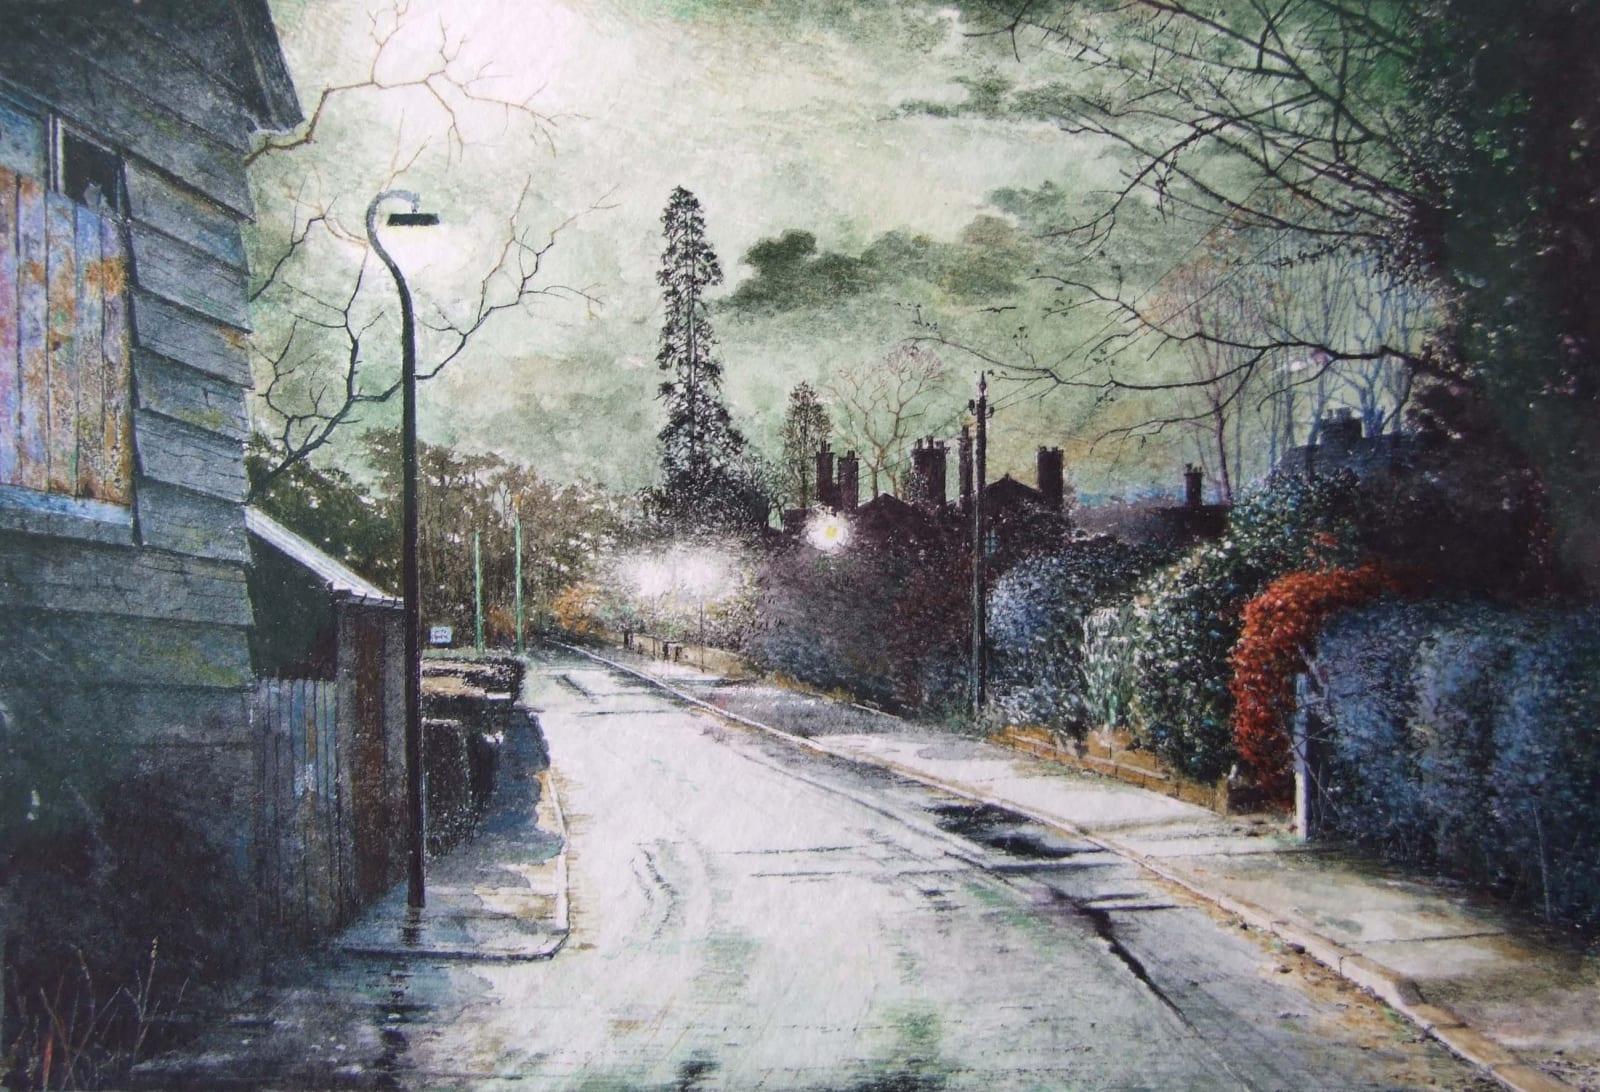 Robert Bates Night scene - Dublin (2007) Watercolour 10.2 x 15 cm